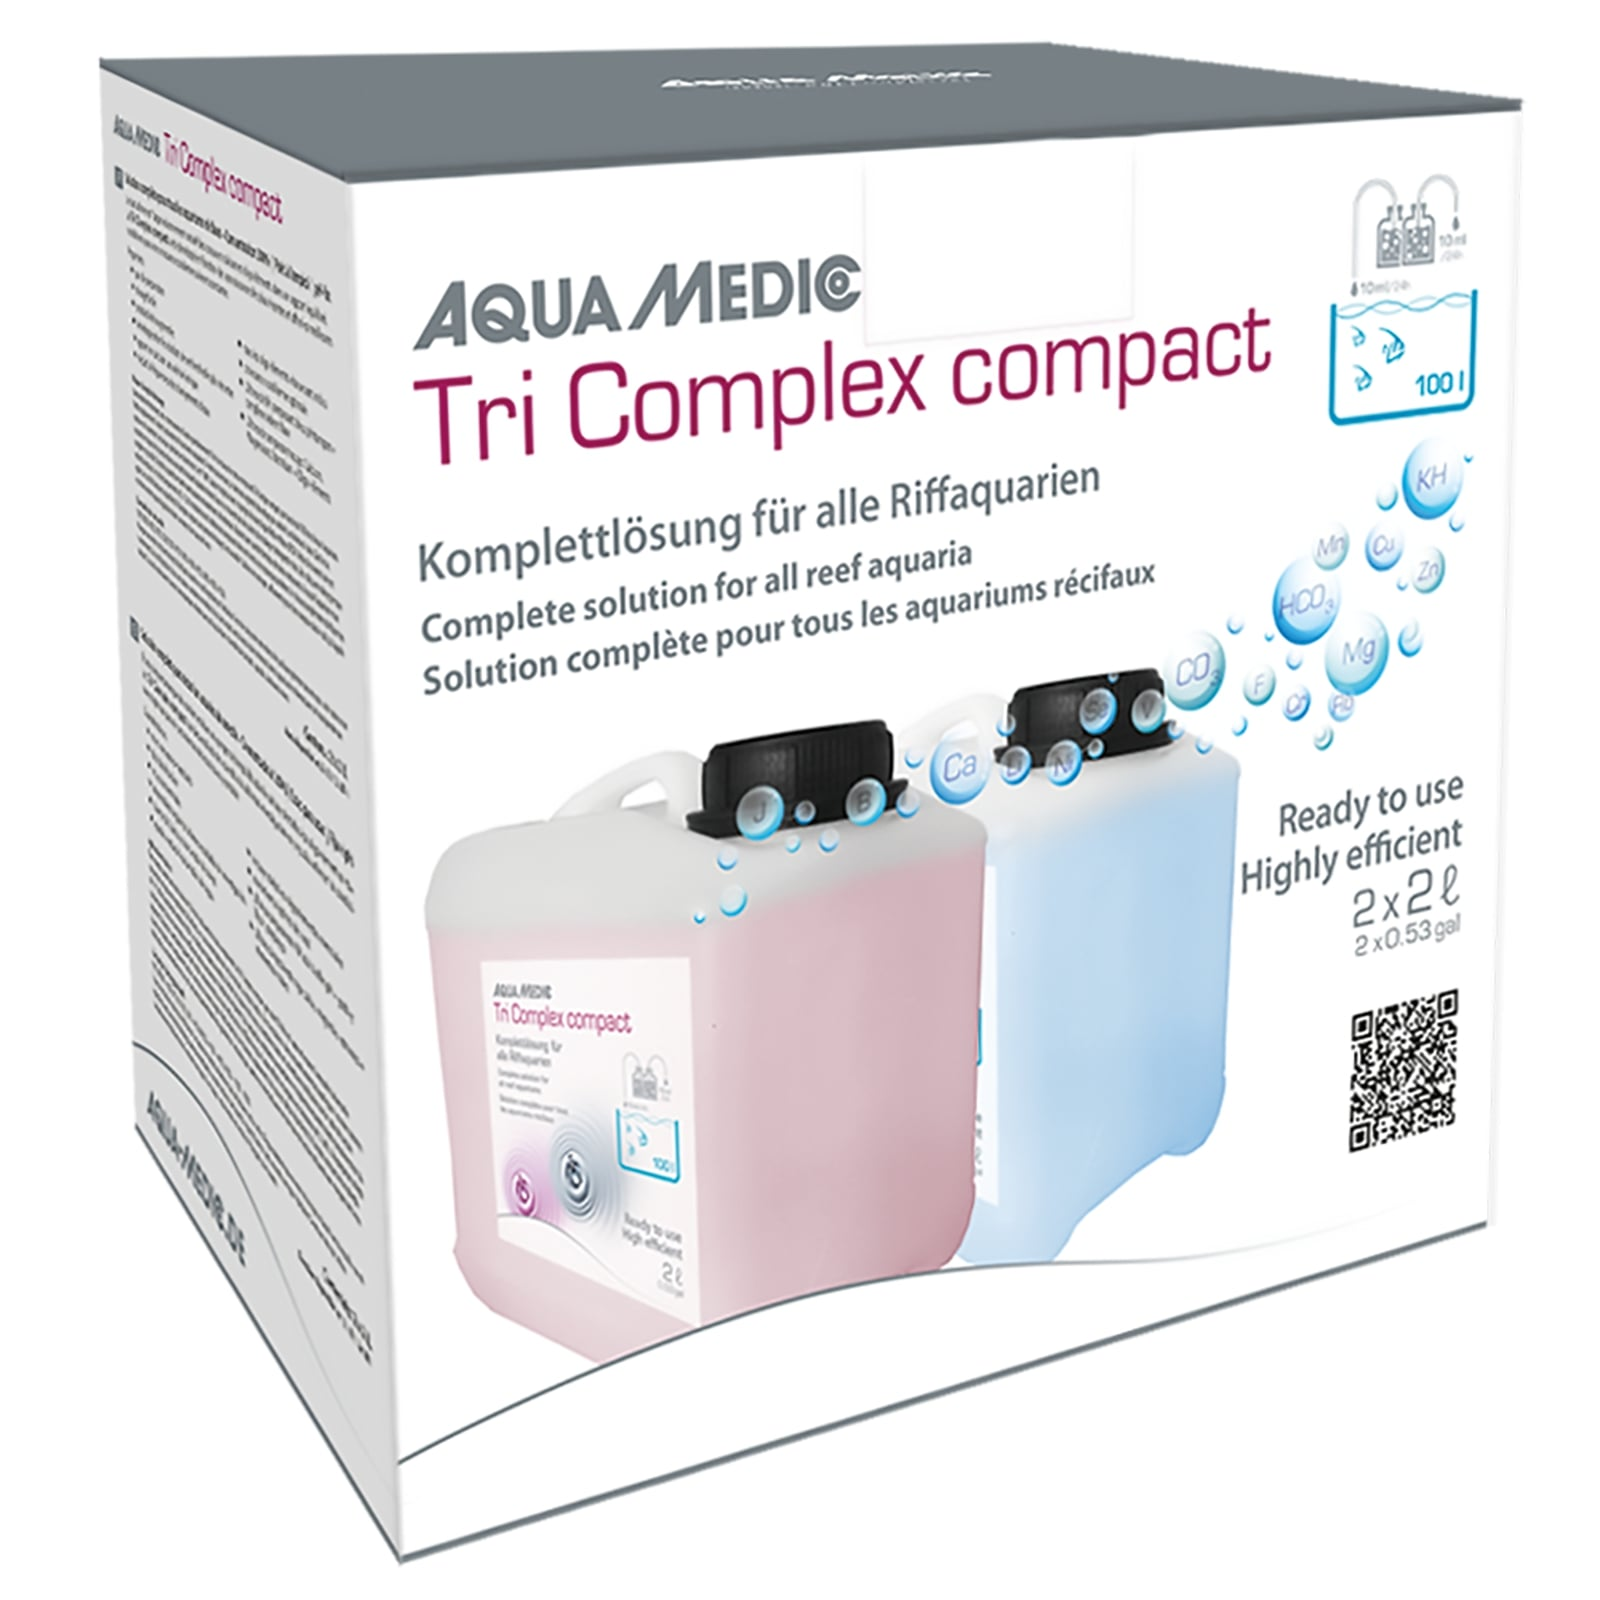 AQUA MEDIC Tri Complex Compact 2 x 2L solution Balling complète pour aquarium récifal